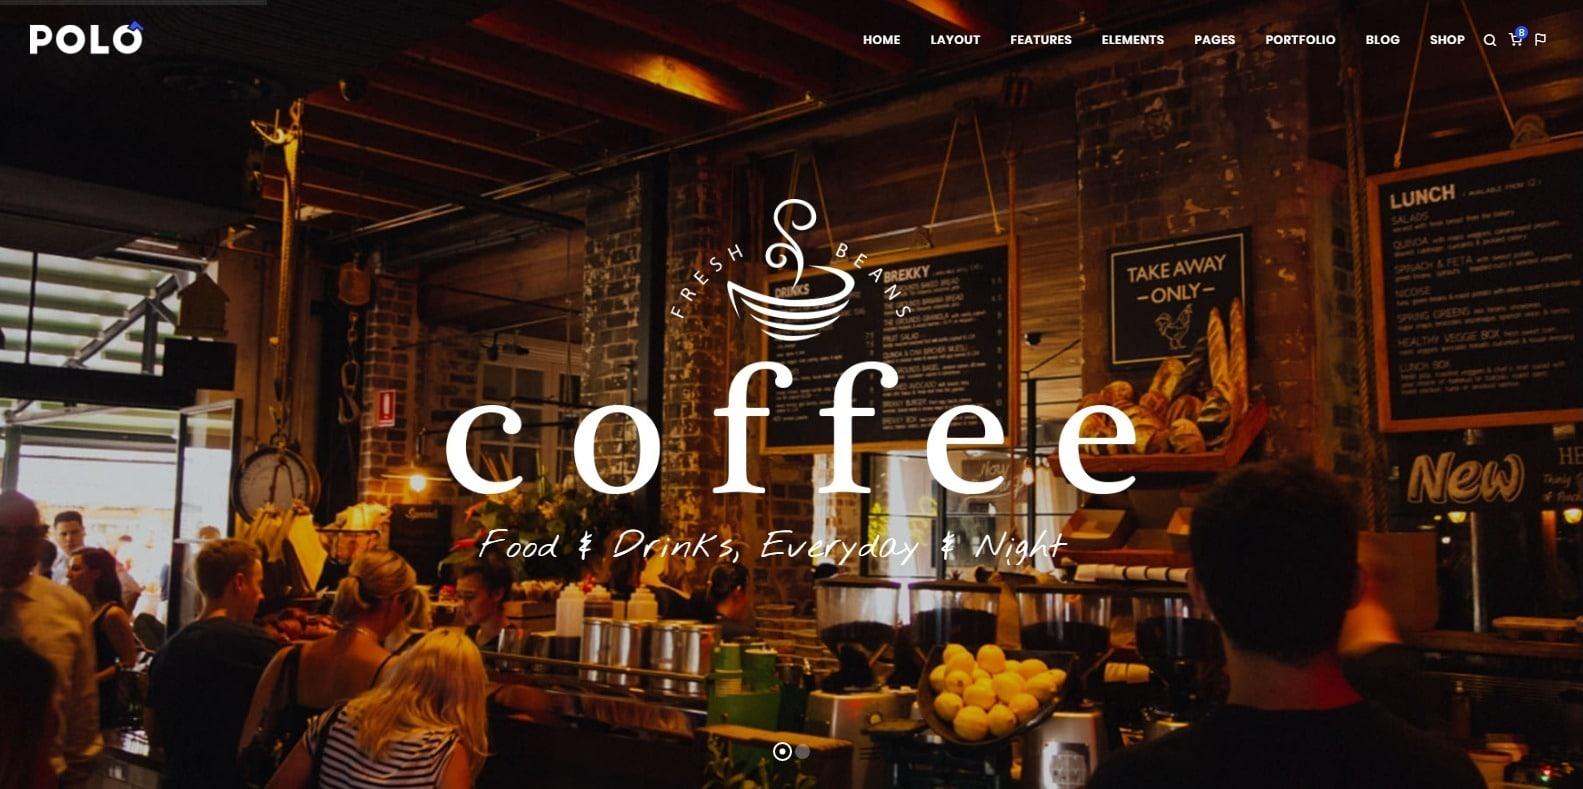 polo-restaurant-website-template